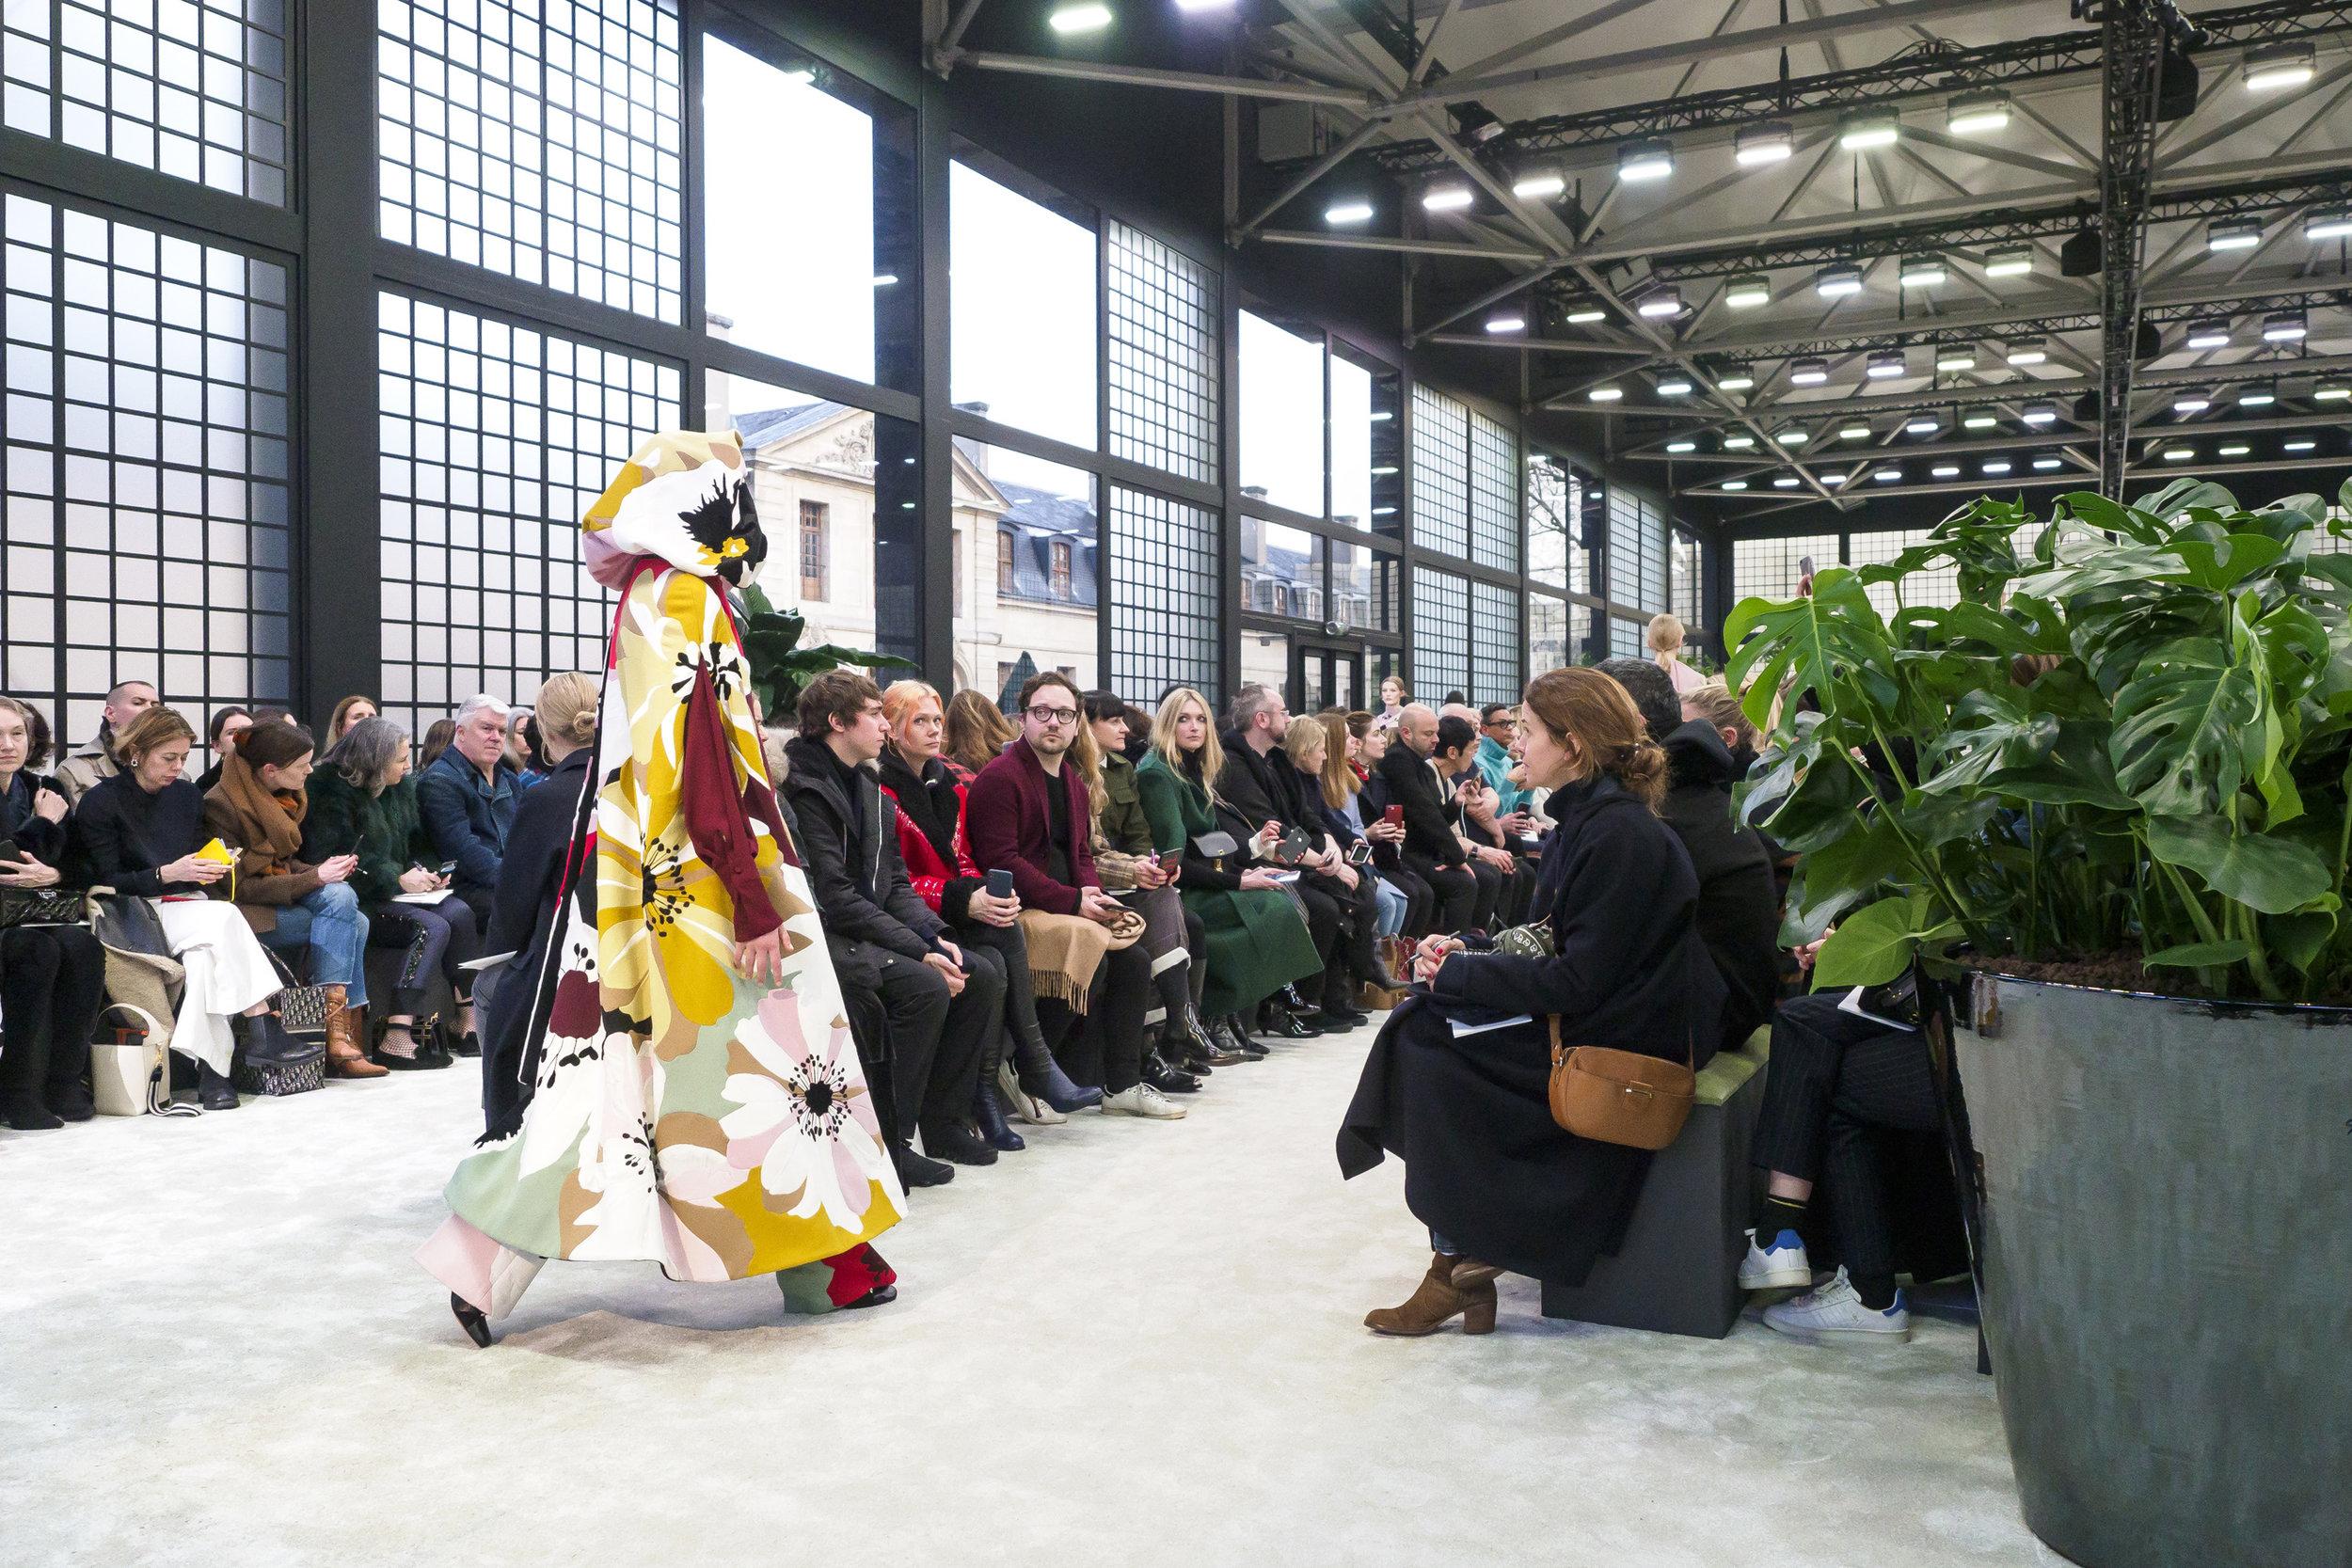 Valentino Autumn/Winter '18 at Paris Fashion Week (Photo: theimpression.com)